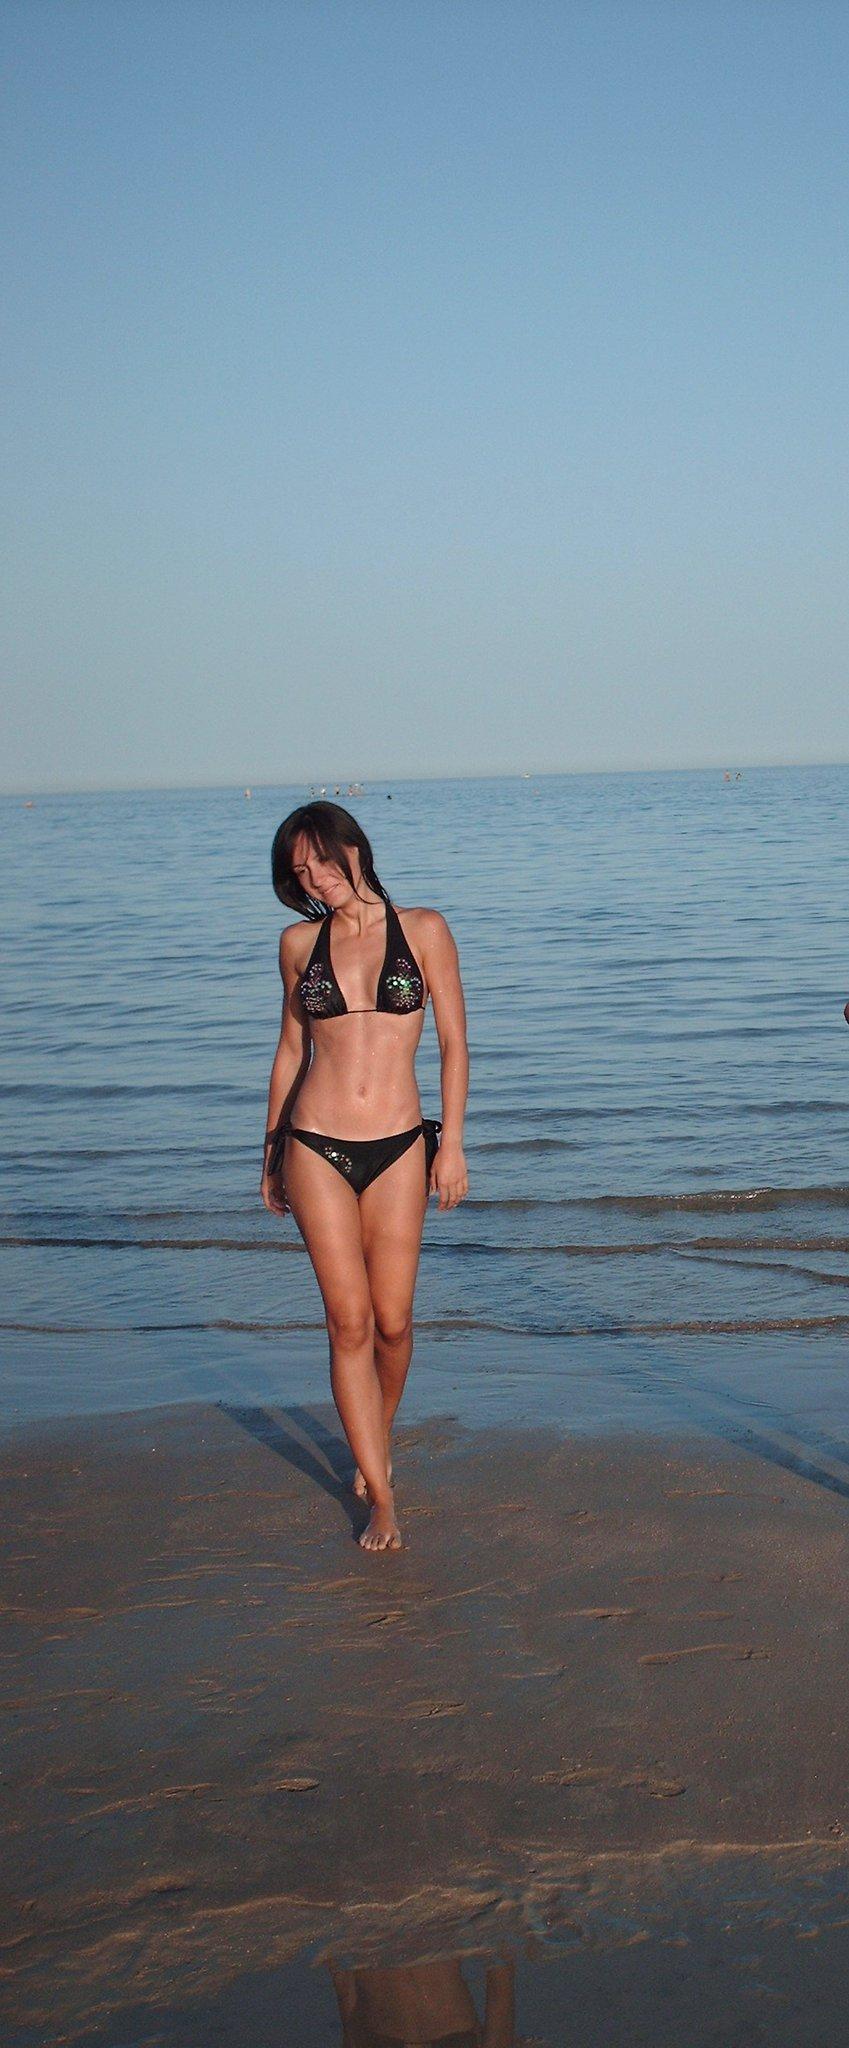 ivana andjelkovic Wannabe Summer Secret by womensecret